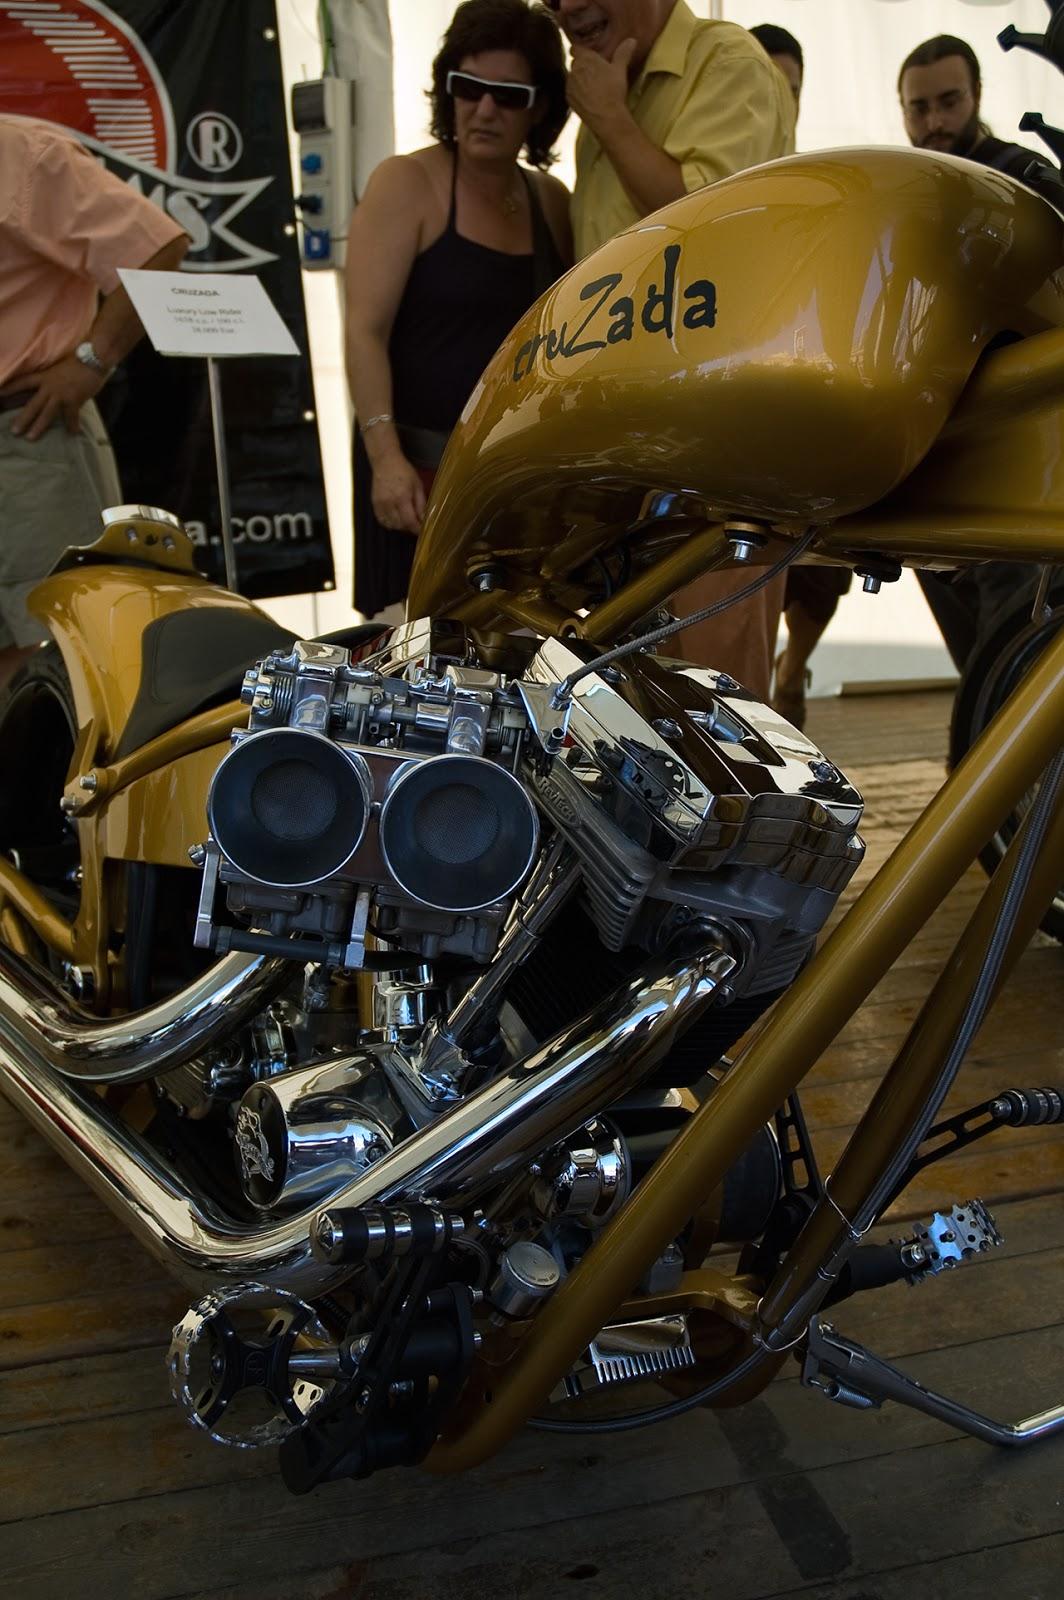 Harley Davidson Chopper Cruzada